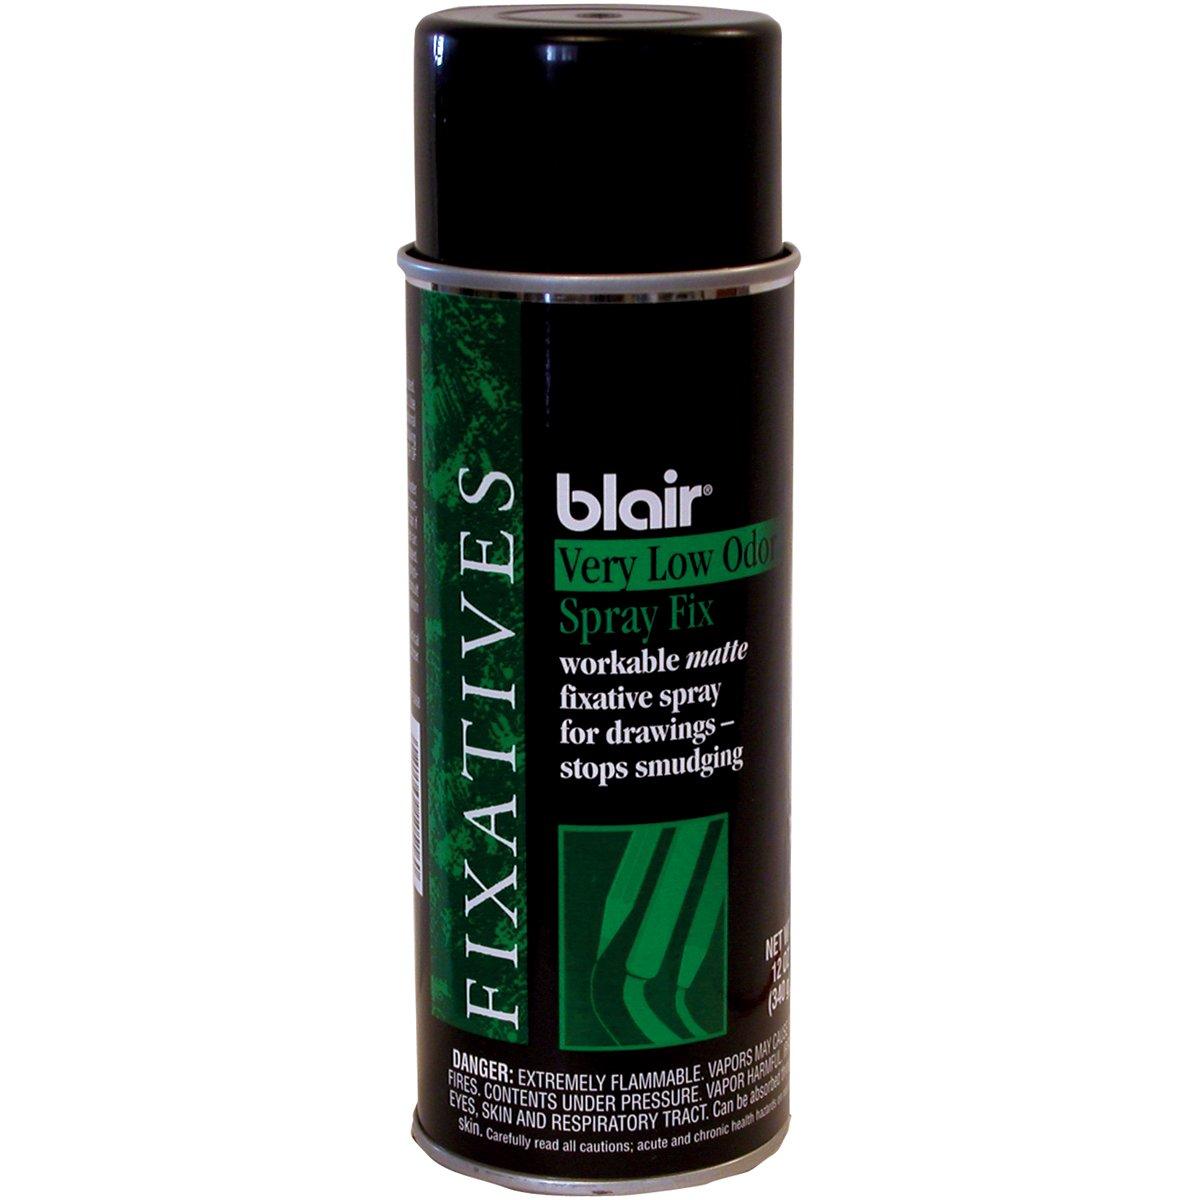 Blair Workable Very Low Odor Fixative Aerosol Spray-12oz Creative Art Materials